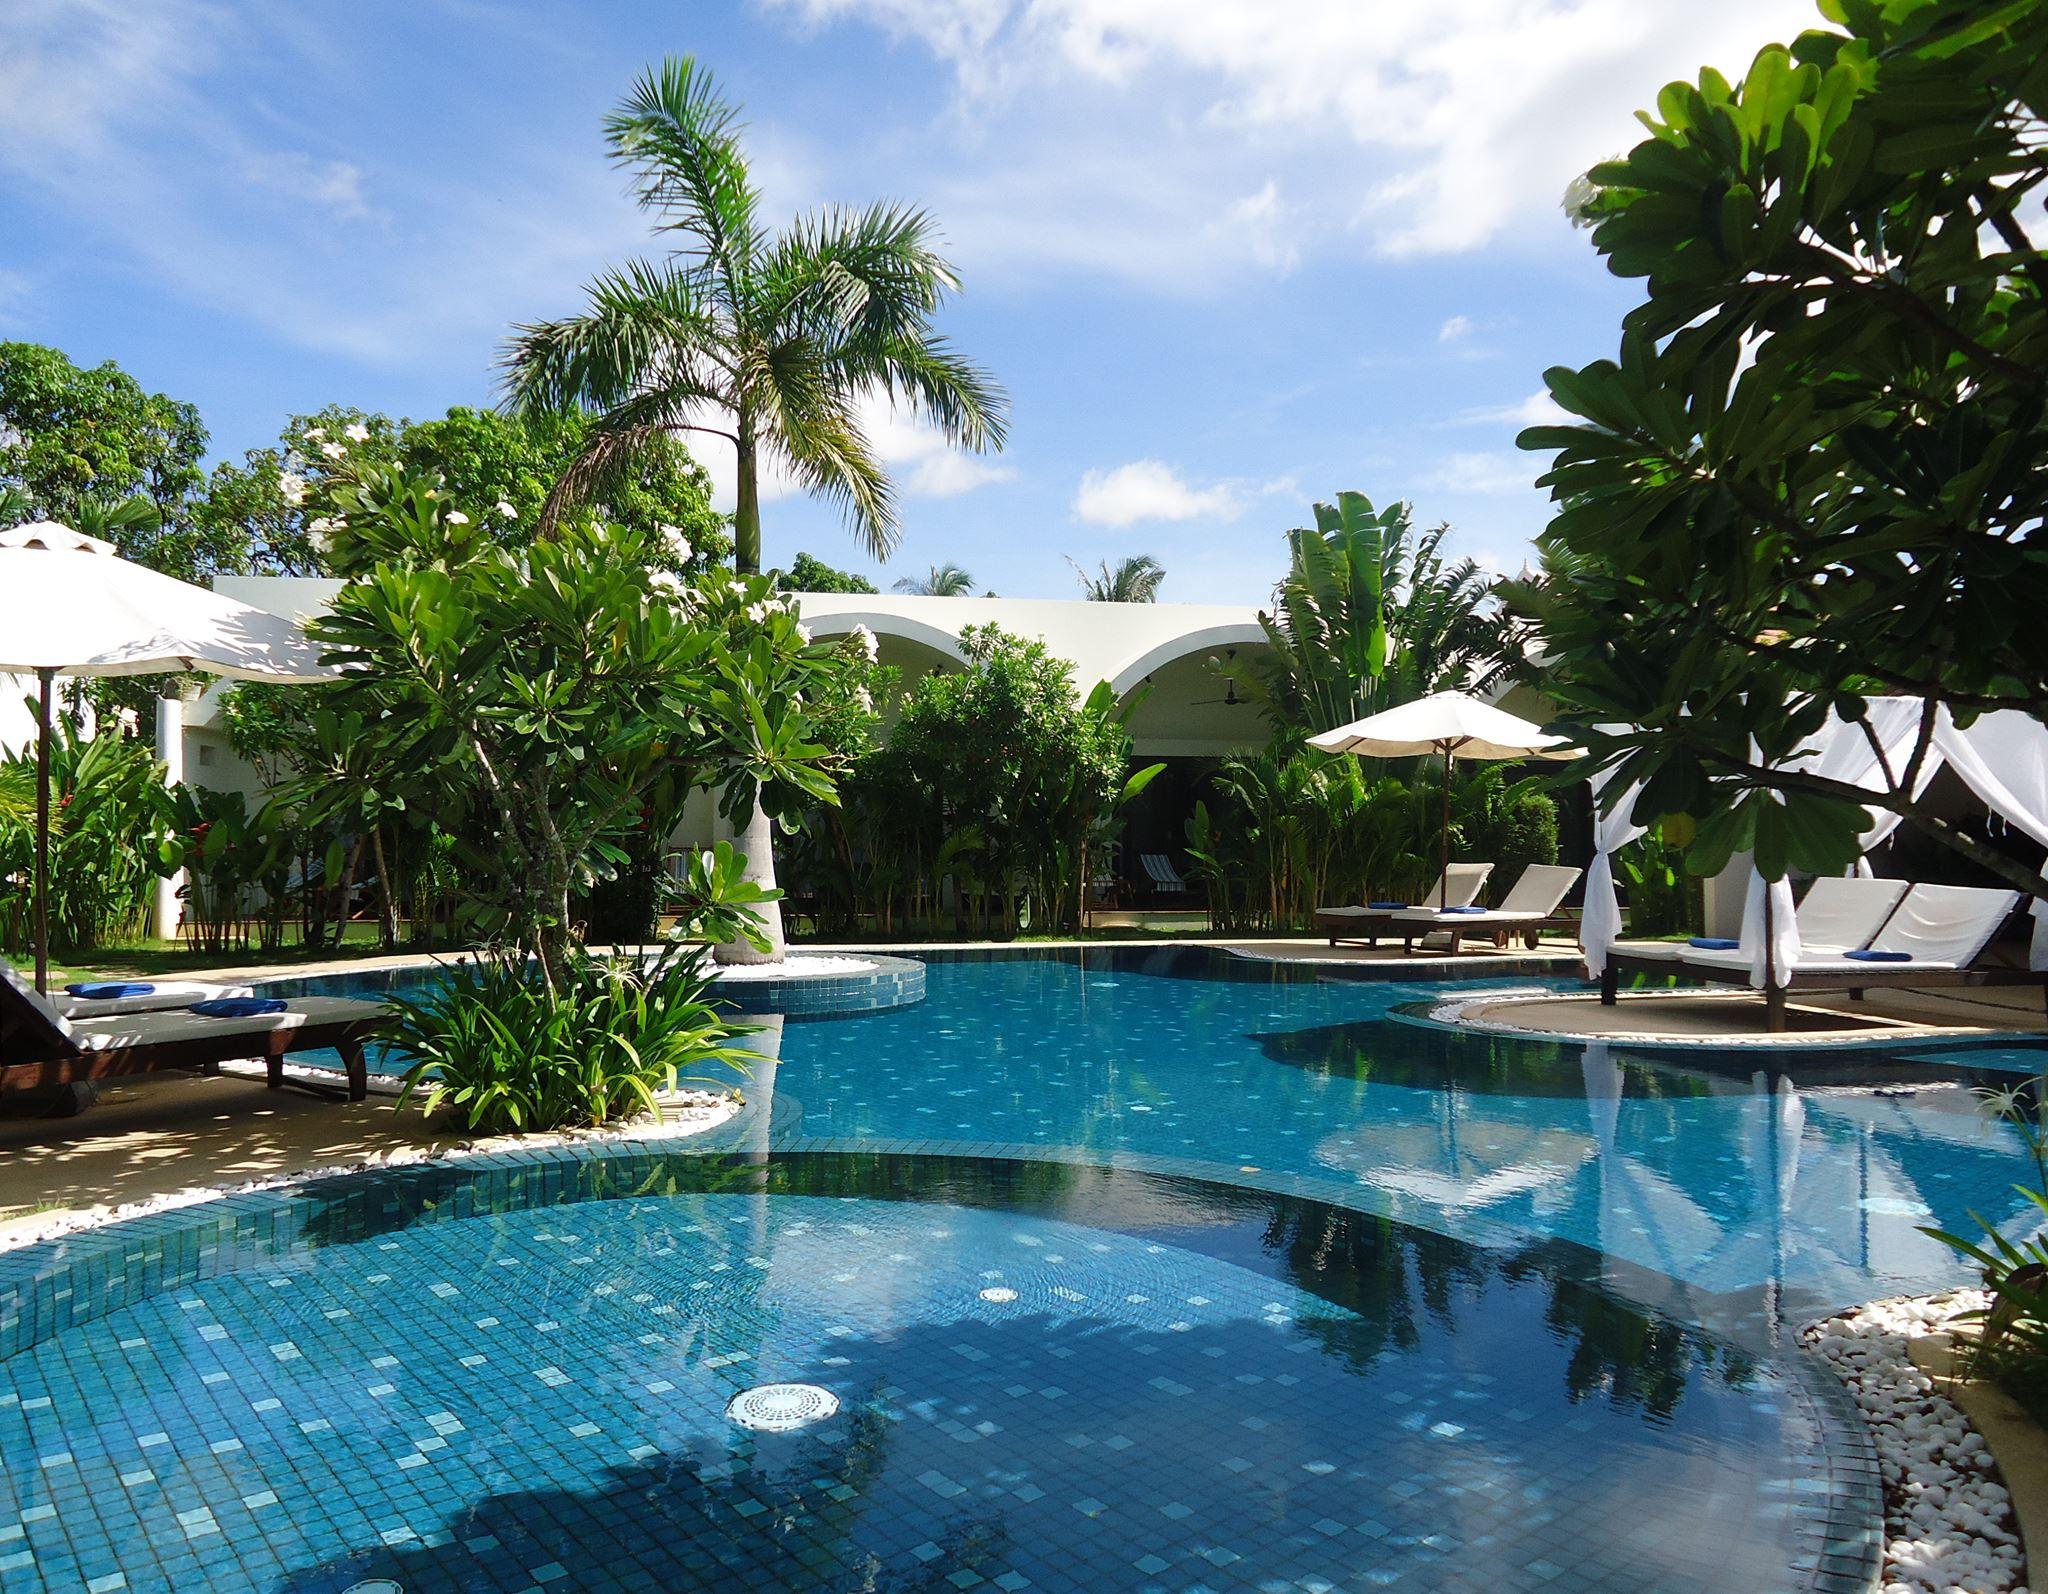 navutu-dreams-resort-and-wellness-retreat-center-krong-siem-reap-cambodia-12